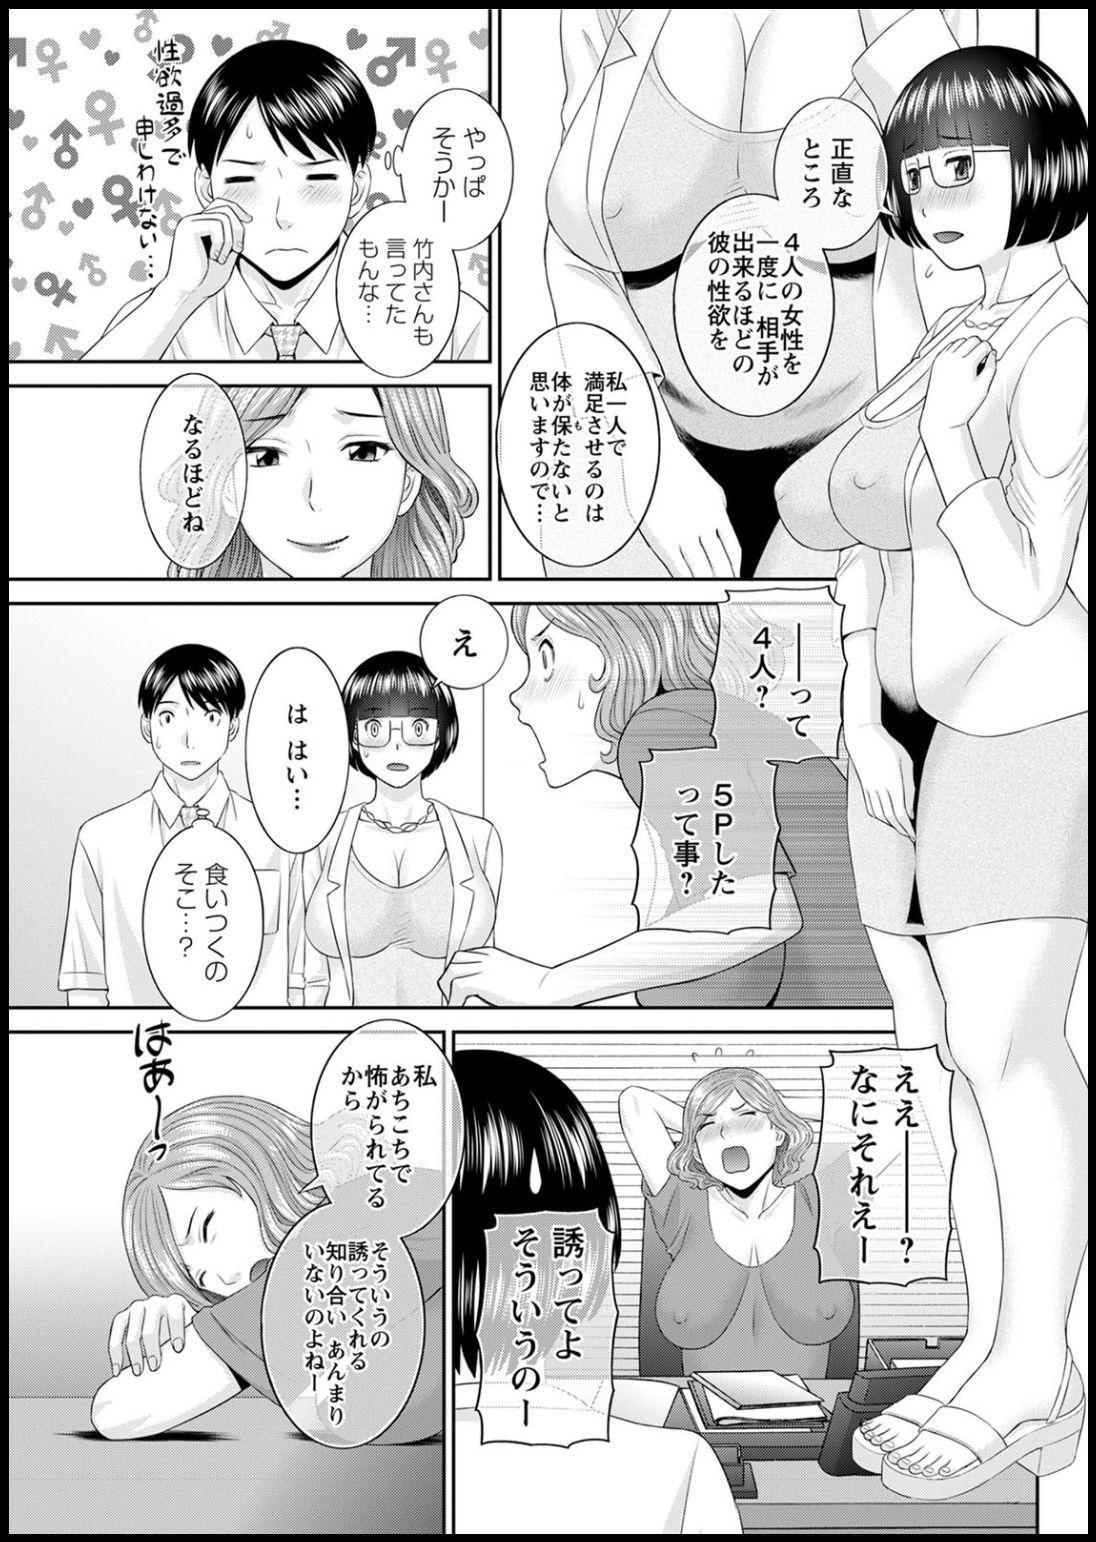 [Kawamori Misaki] Kaikan Hitotsuma Gakuen Ch. 1-6, 8-20 [Digital] 317